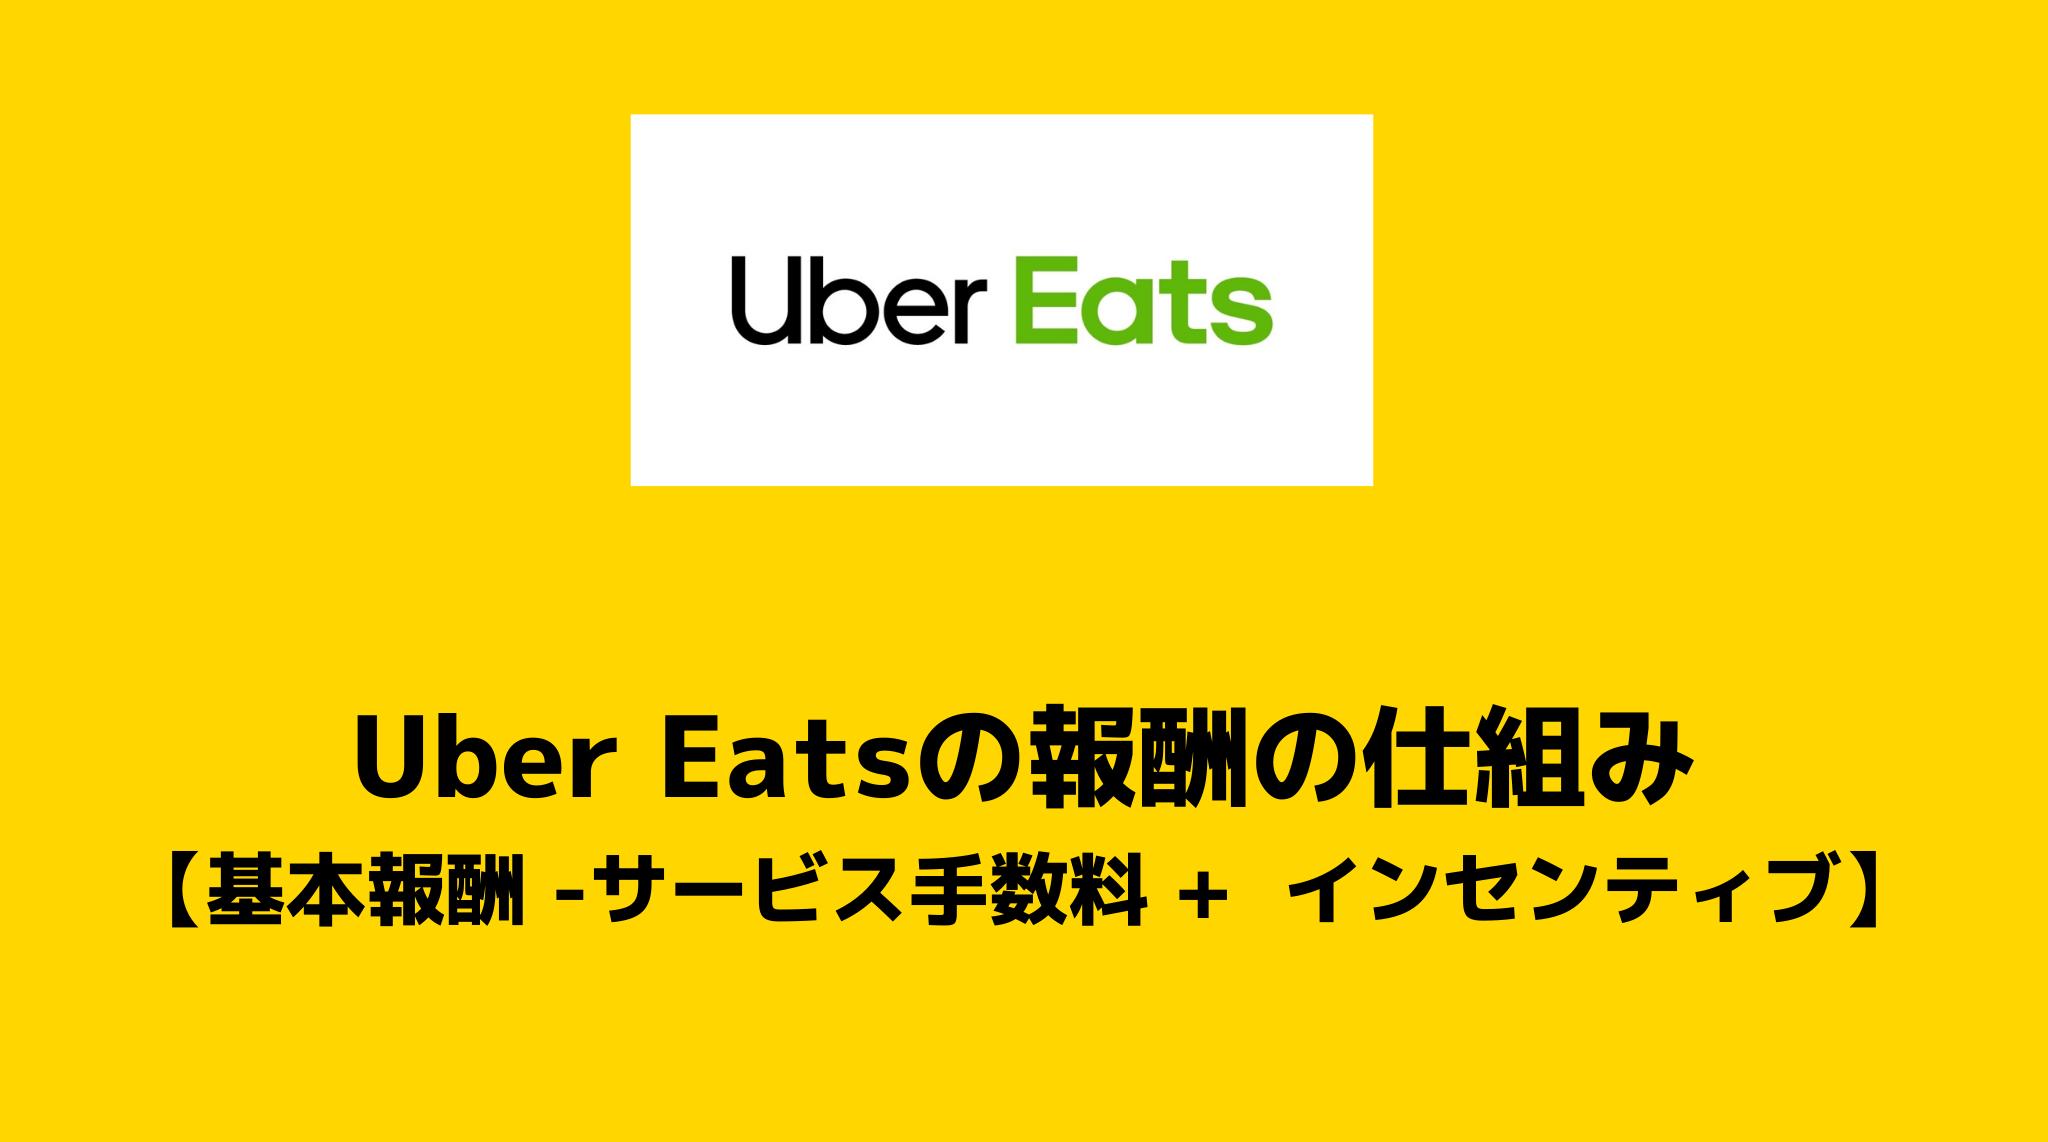 Uber Eats(ウーバーイーツ)の報酬の仕組み